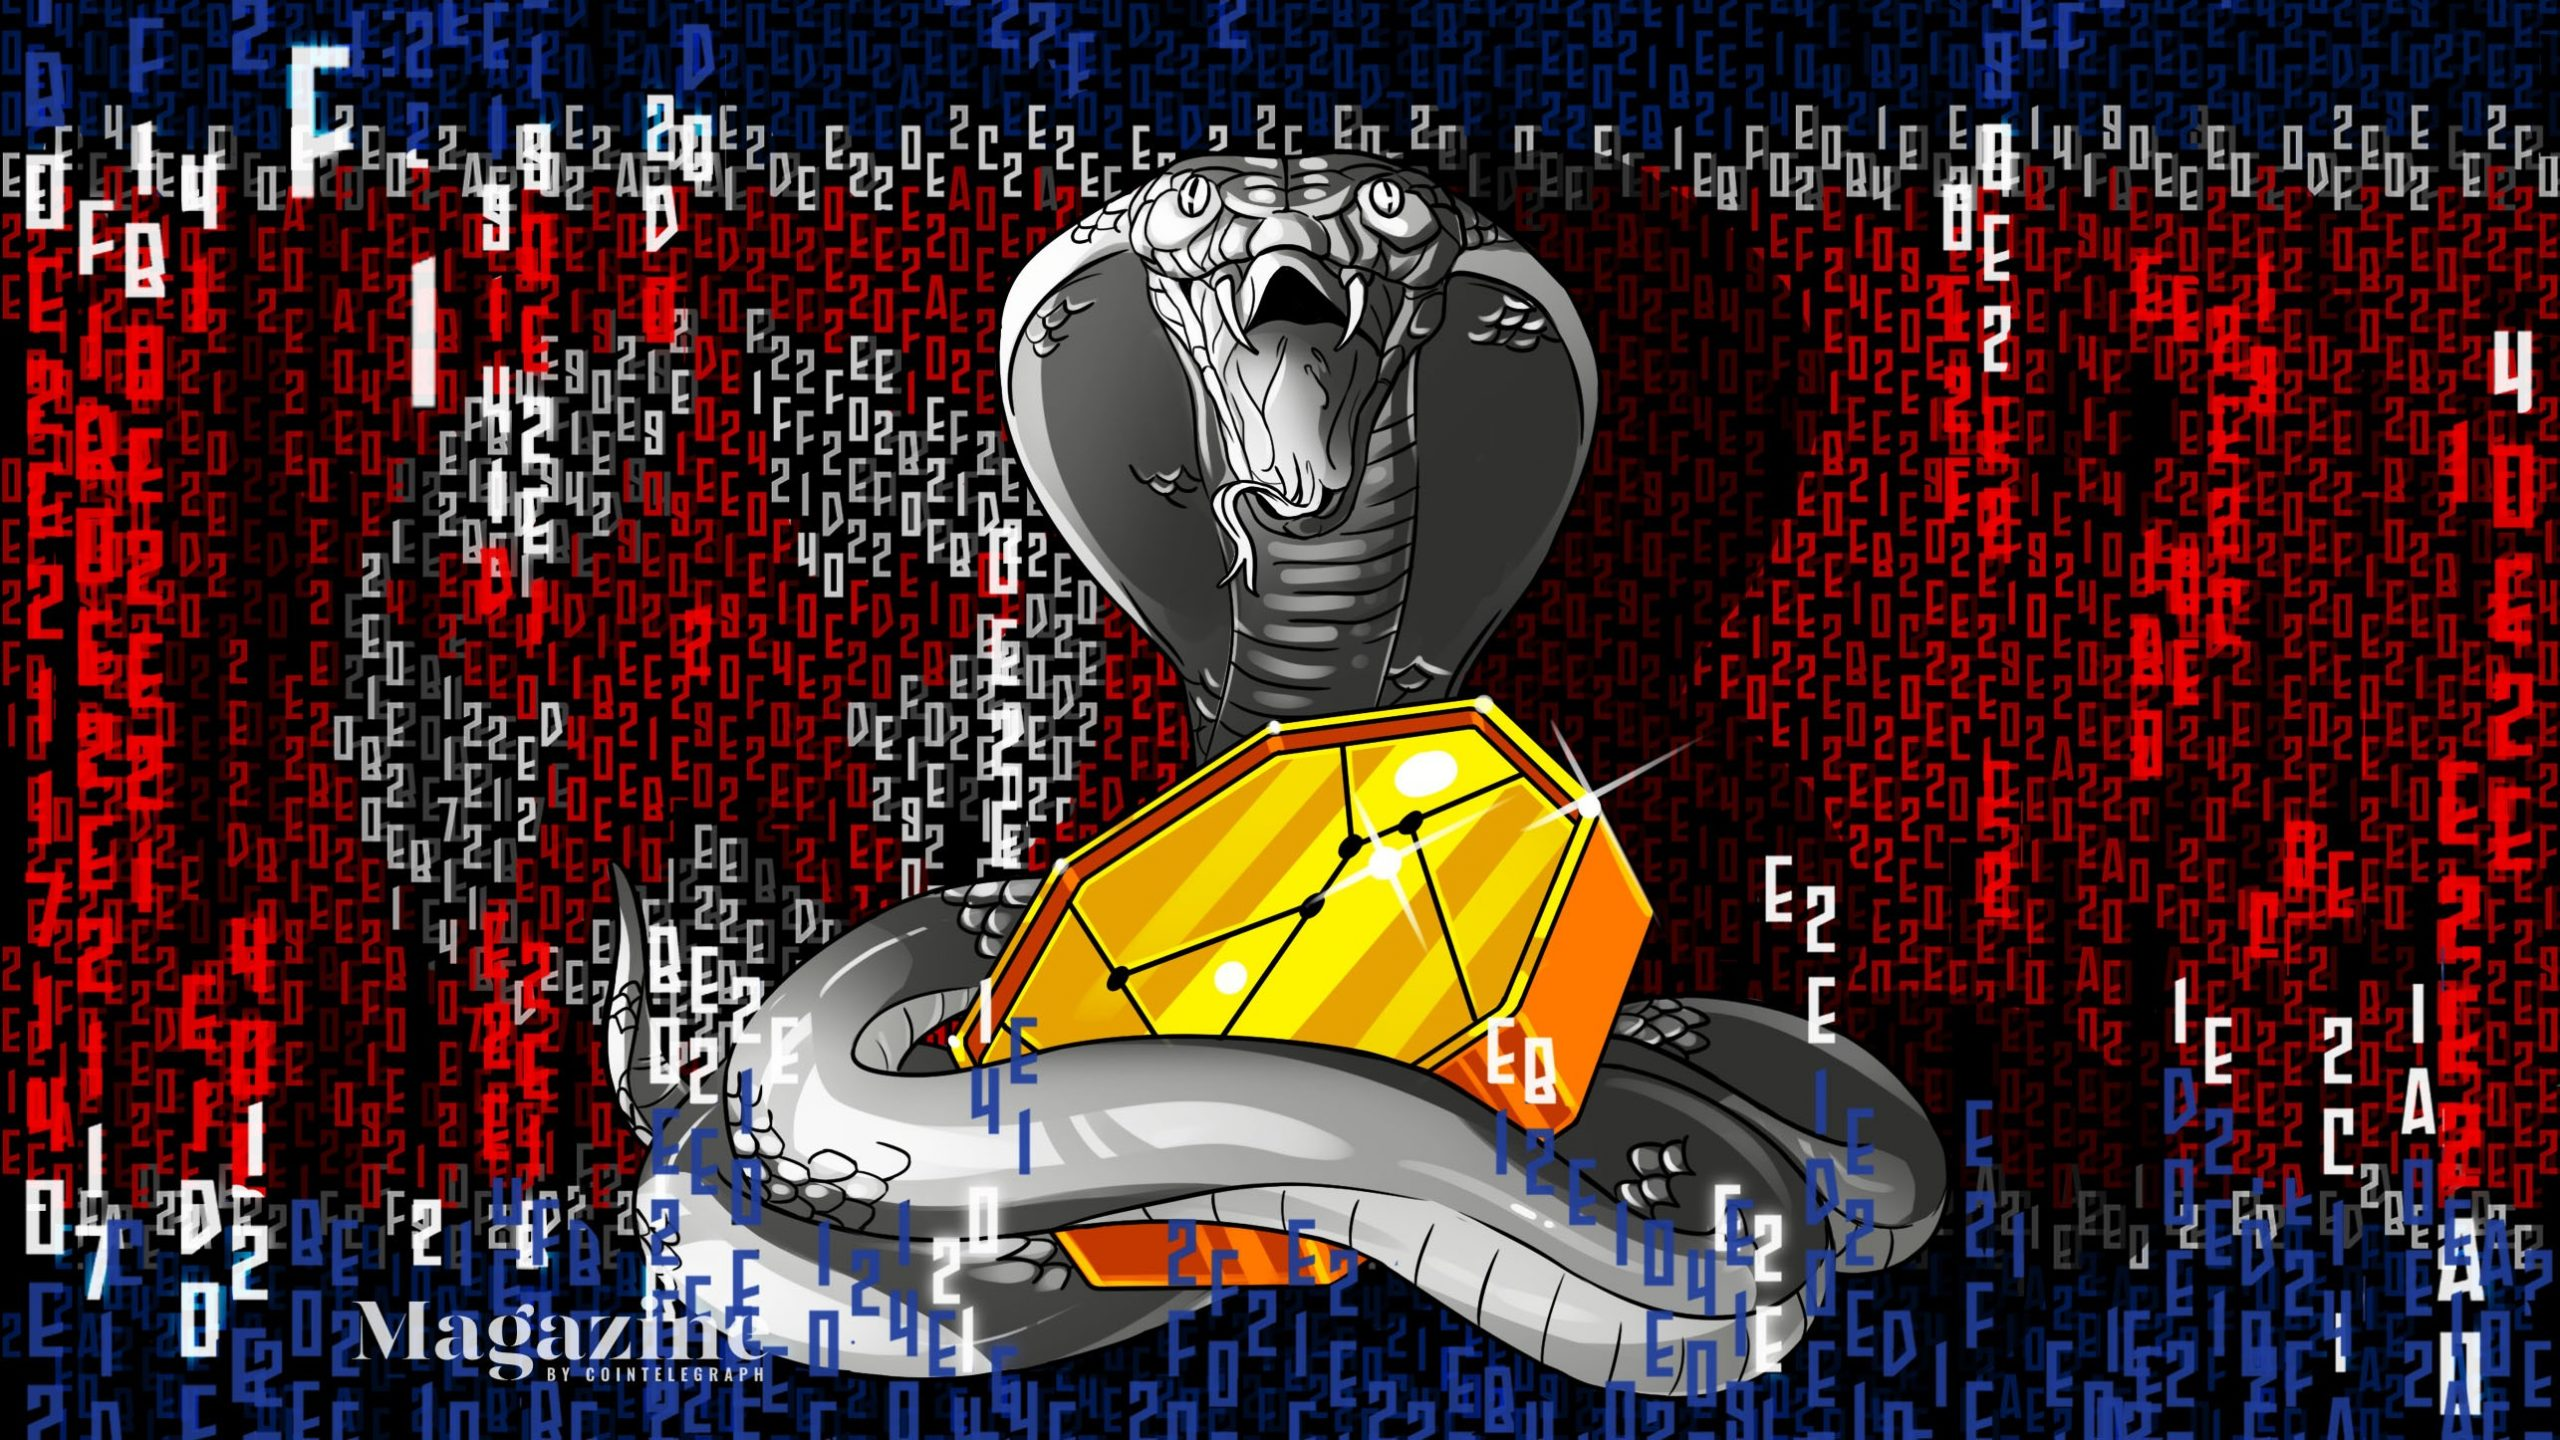 North-Korean-crypto-hacking-Lazarus-Beagleboyz-hiddencobra-scaled.jpg